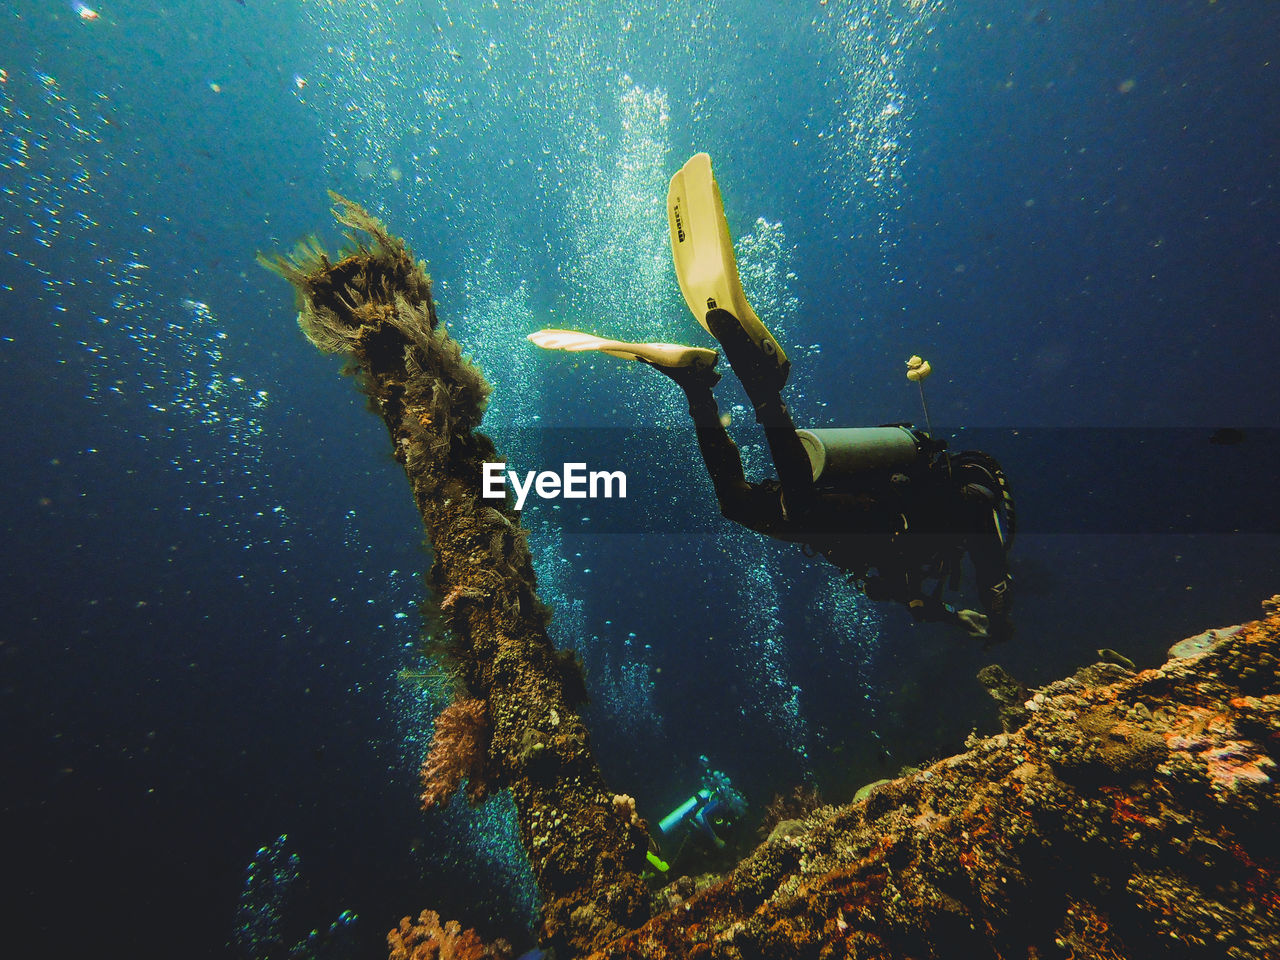 underwater, undersea, swimming, water, sea, exploration, scuba diving, aquatic sport, sport, adventure, one person, sea life, nature, real people, animal wildlife, animals in the wild, marine, underwater diving